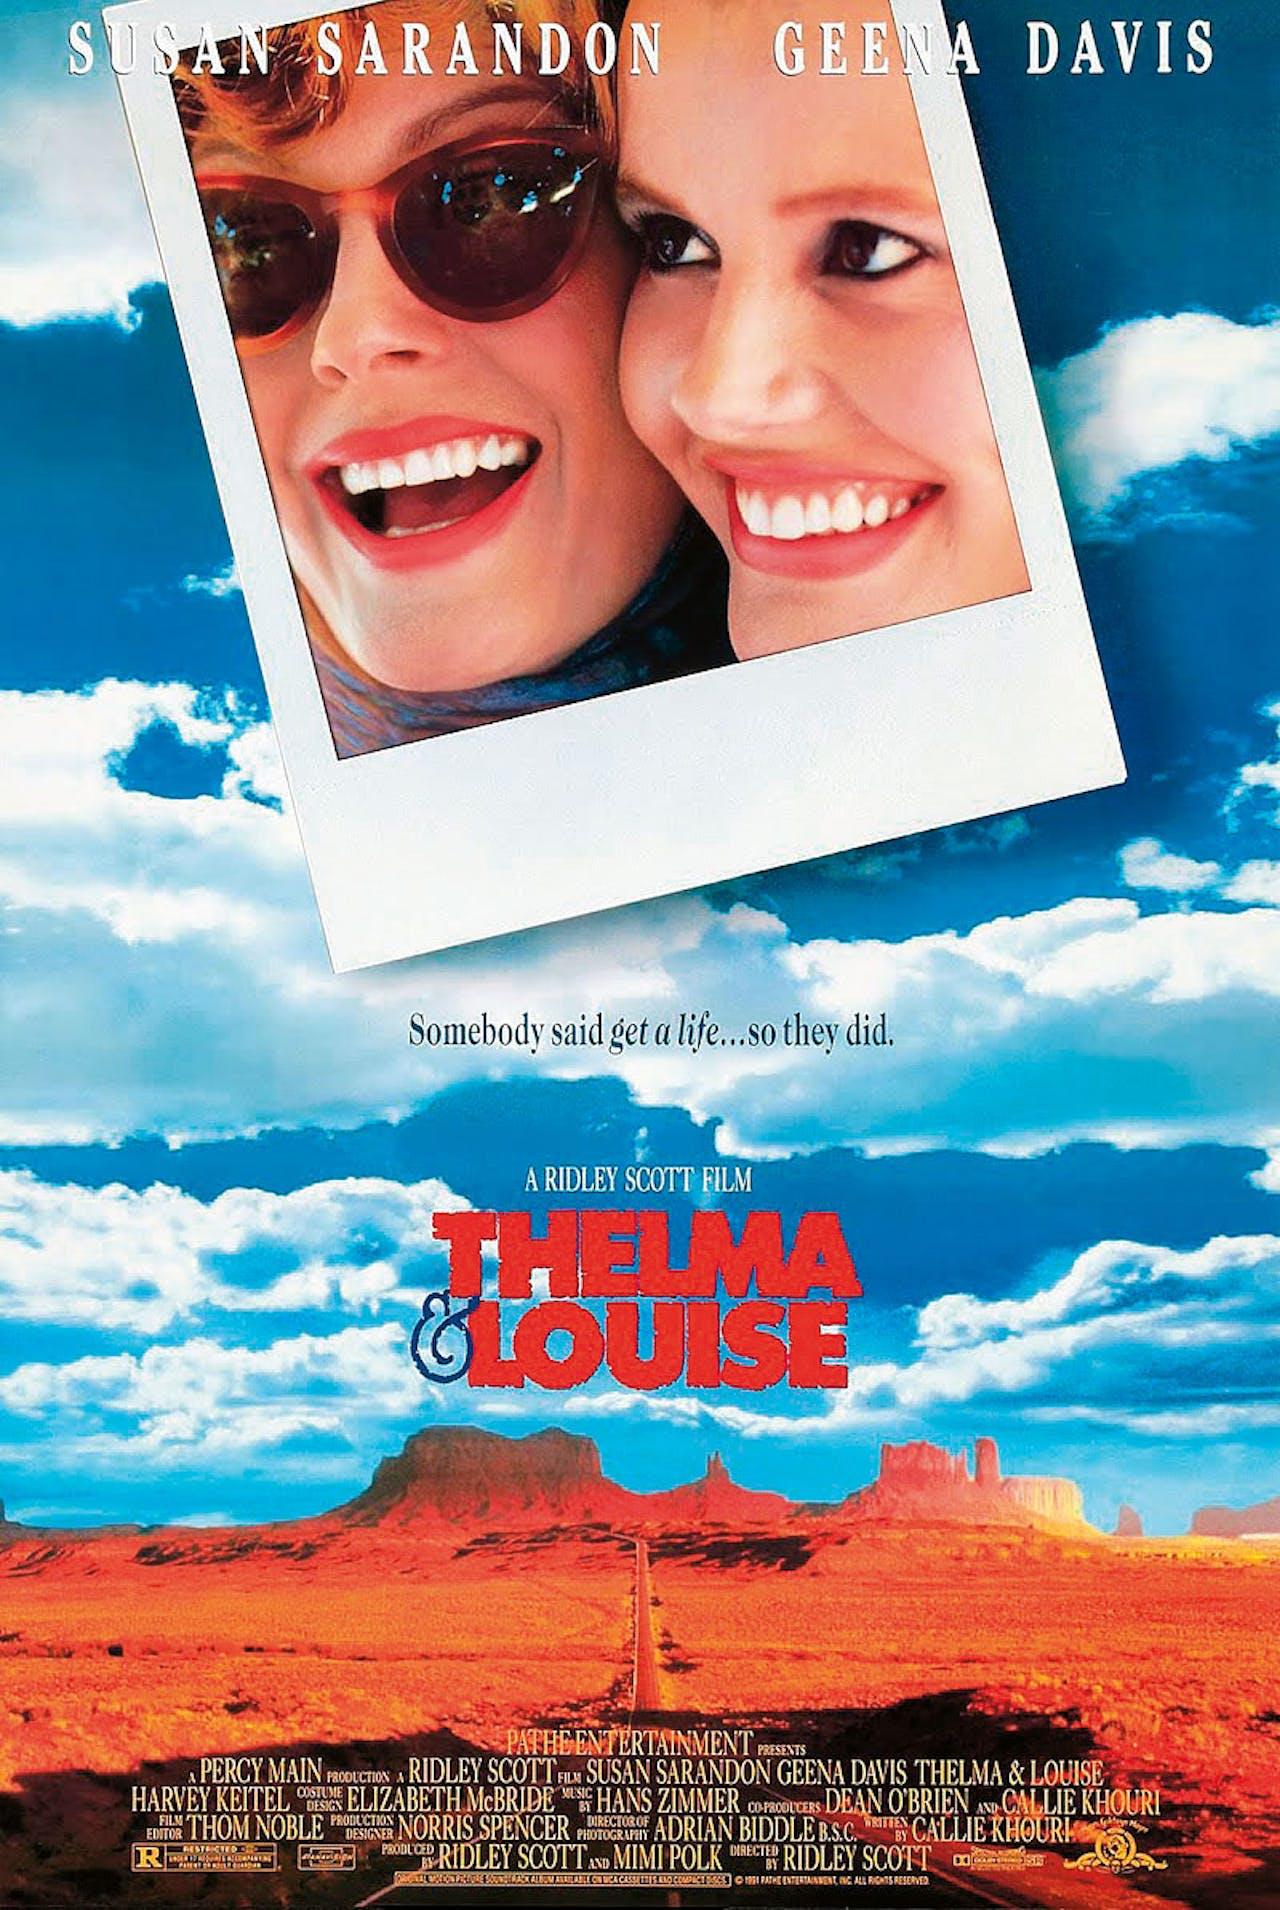 Thelma & Louise (Ridley Scott, 1991) | 1966 Ford Thunderbird Convertible